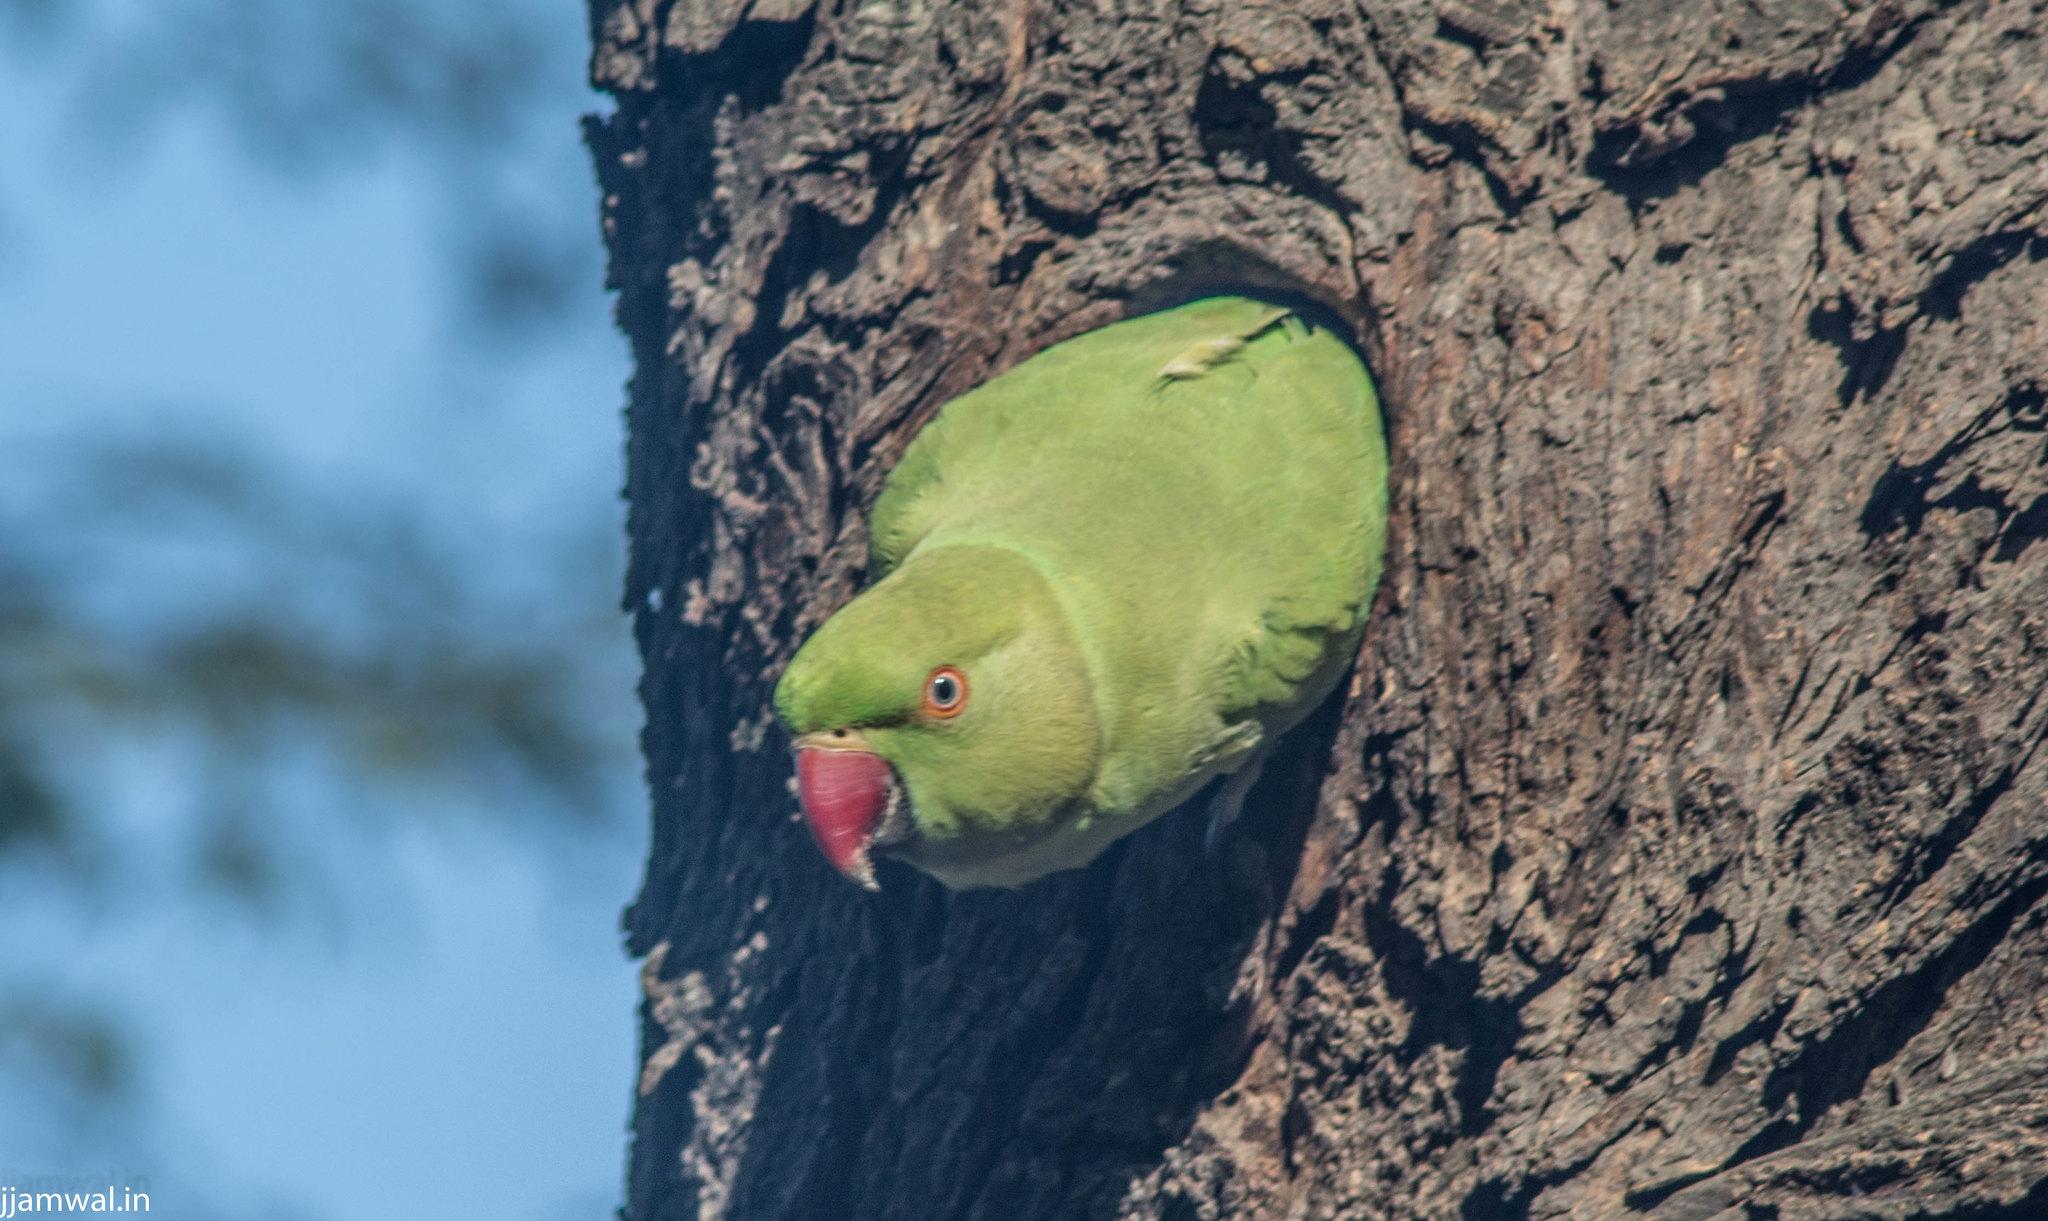 Rose-ringed parakeet (Psittacula krameri), also known as the ring-necked parakeet